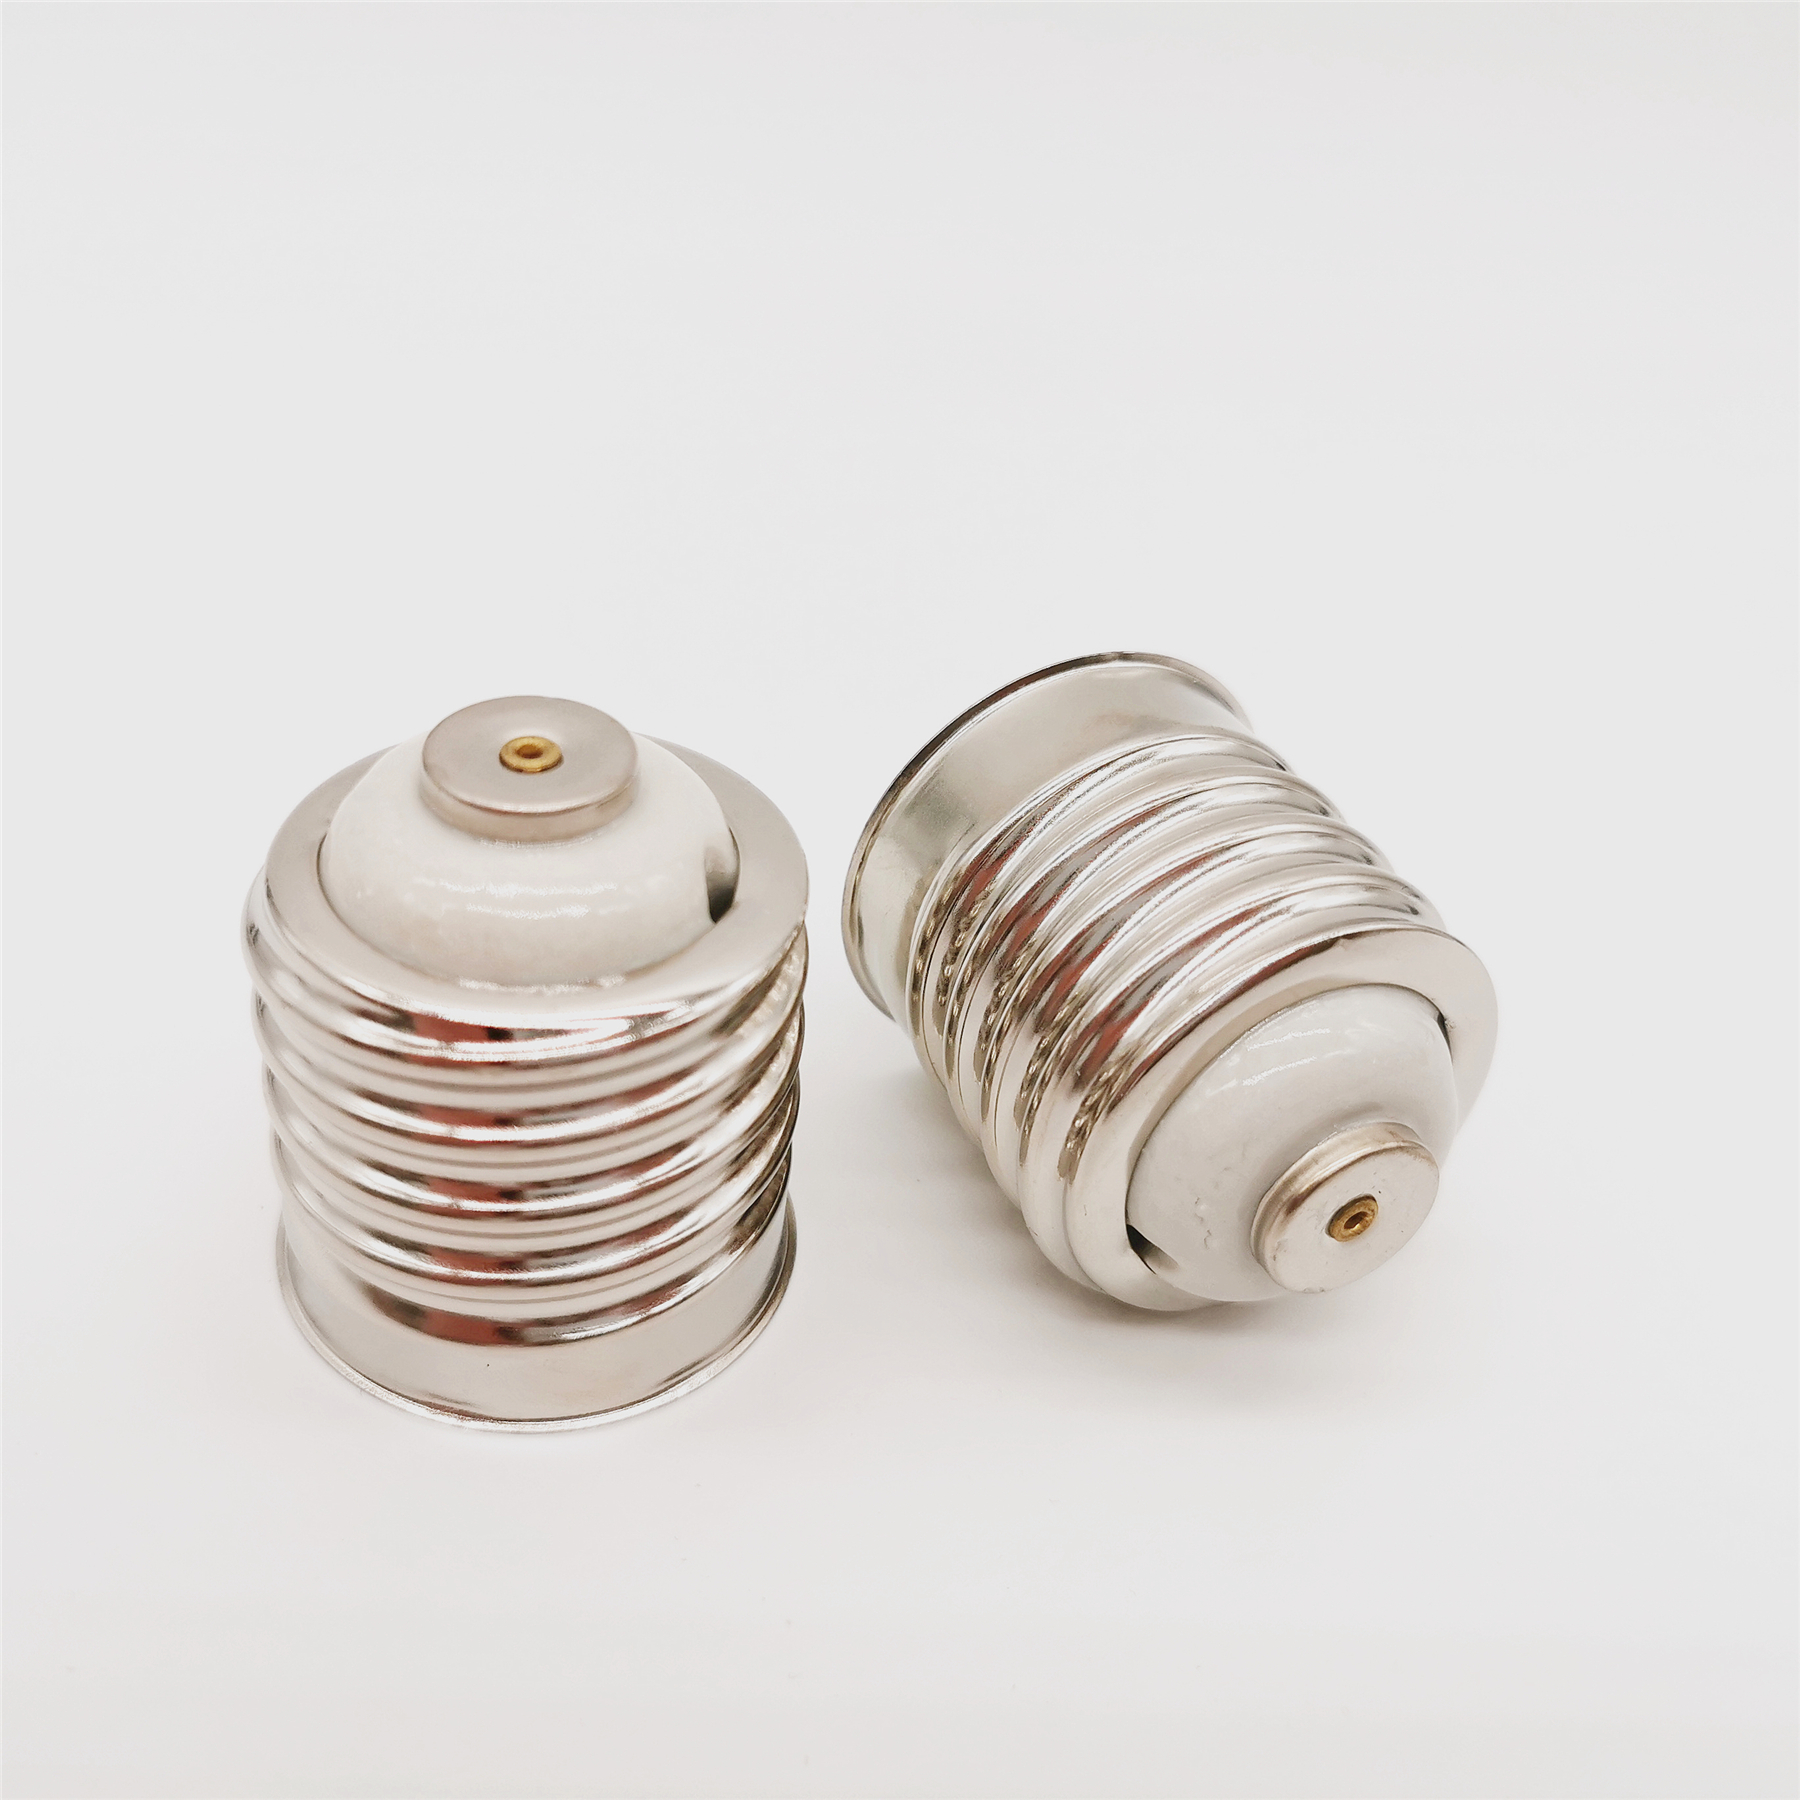 edison screw e40 porcelain lamp E40 copper ceramic lampholder  with holes E40 brass base e40 lamp socket E40 ceramic lamp holder